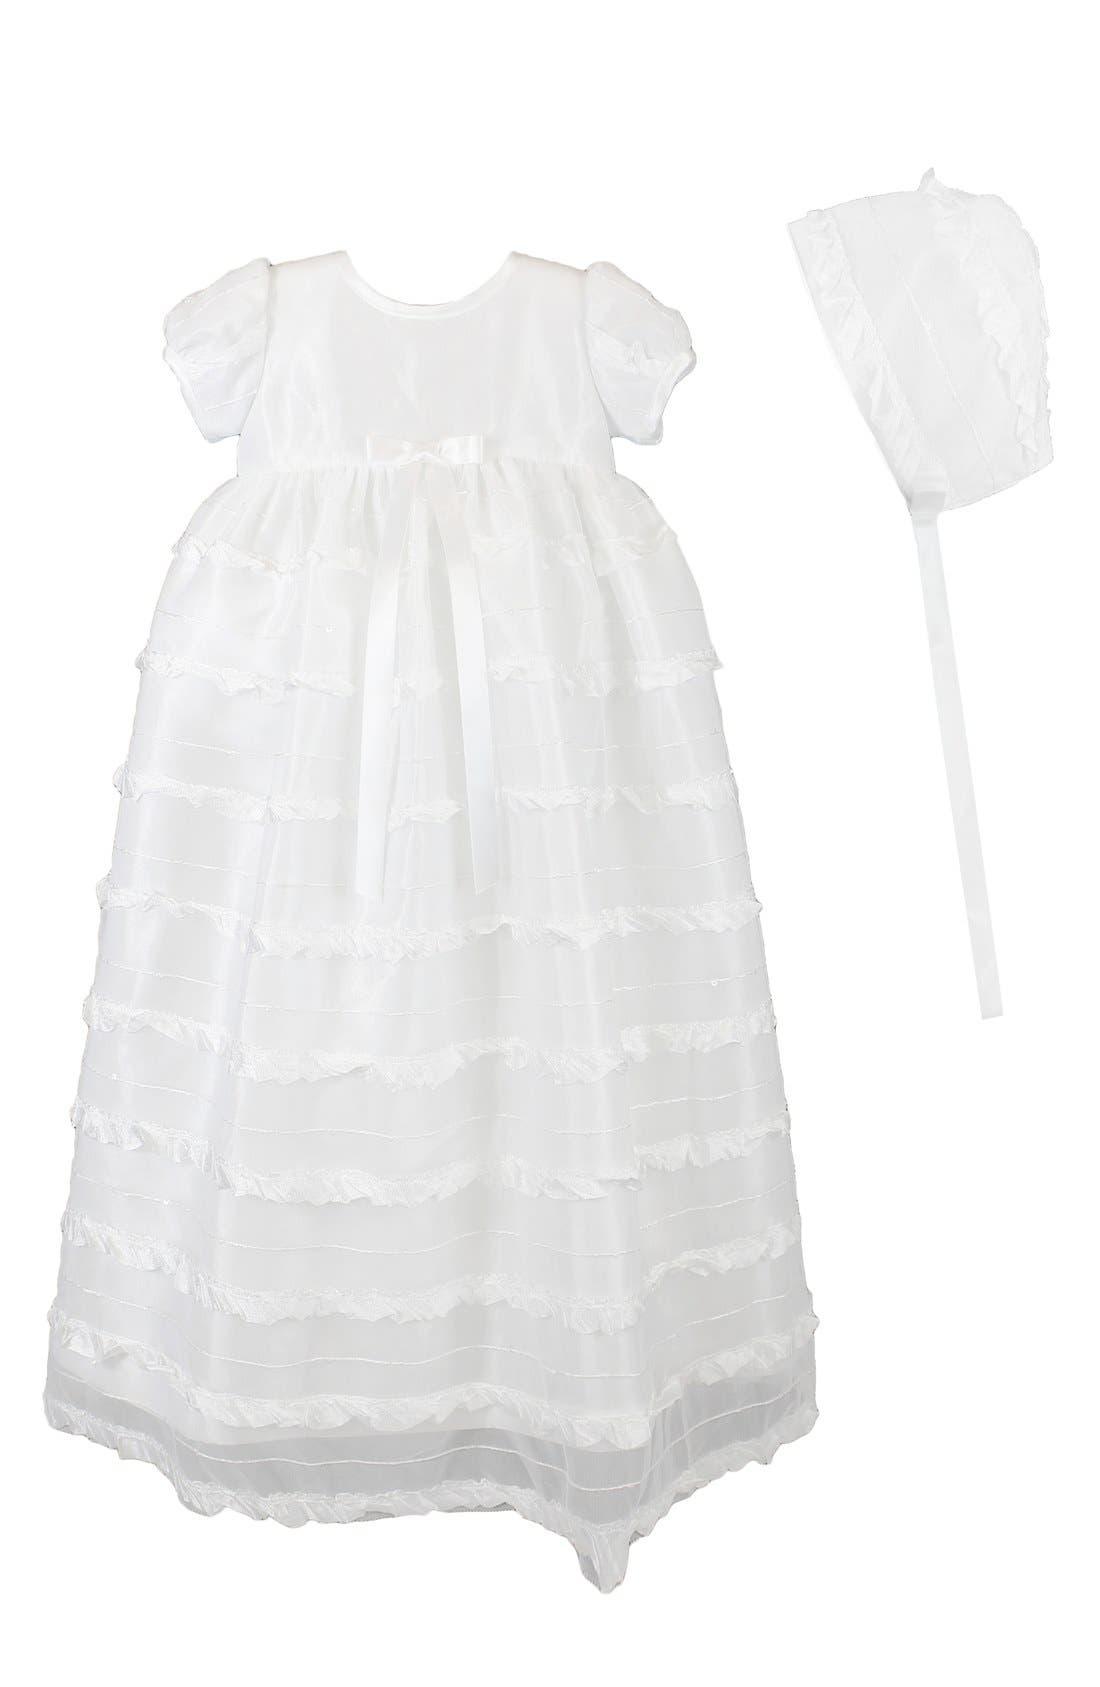 C.I. Castro & Co 'Eyelash' Christening Gown & Bonnet,                         Main,                         color, WHITE